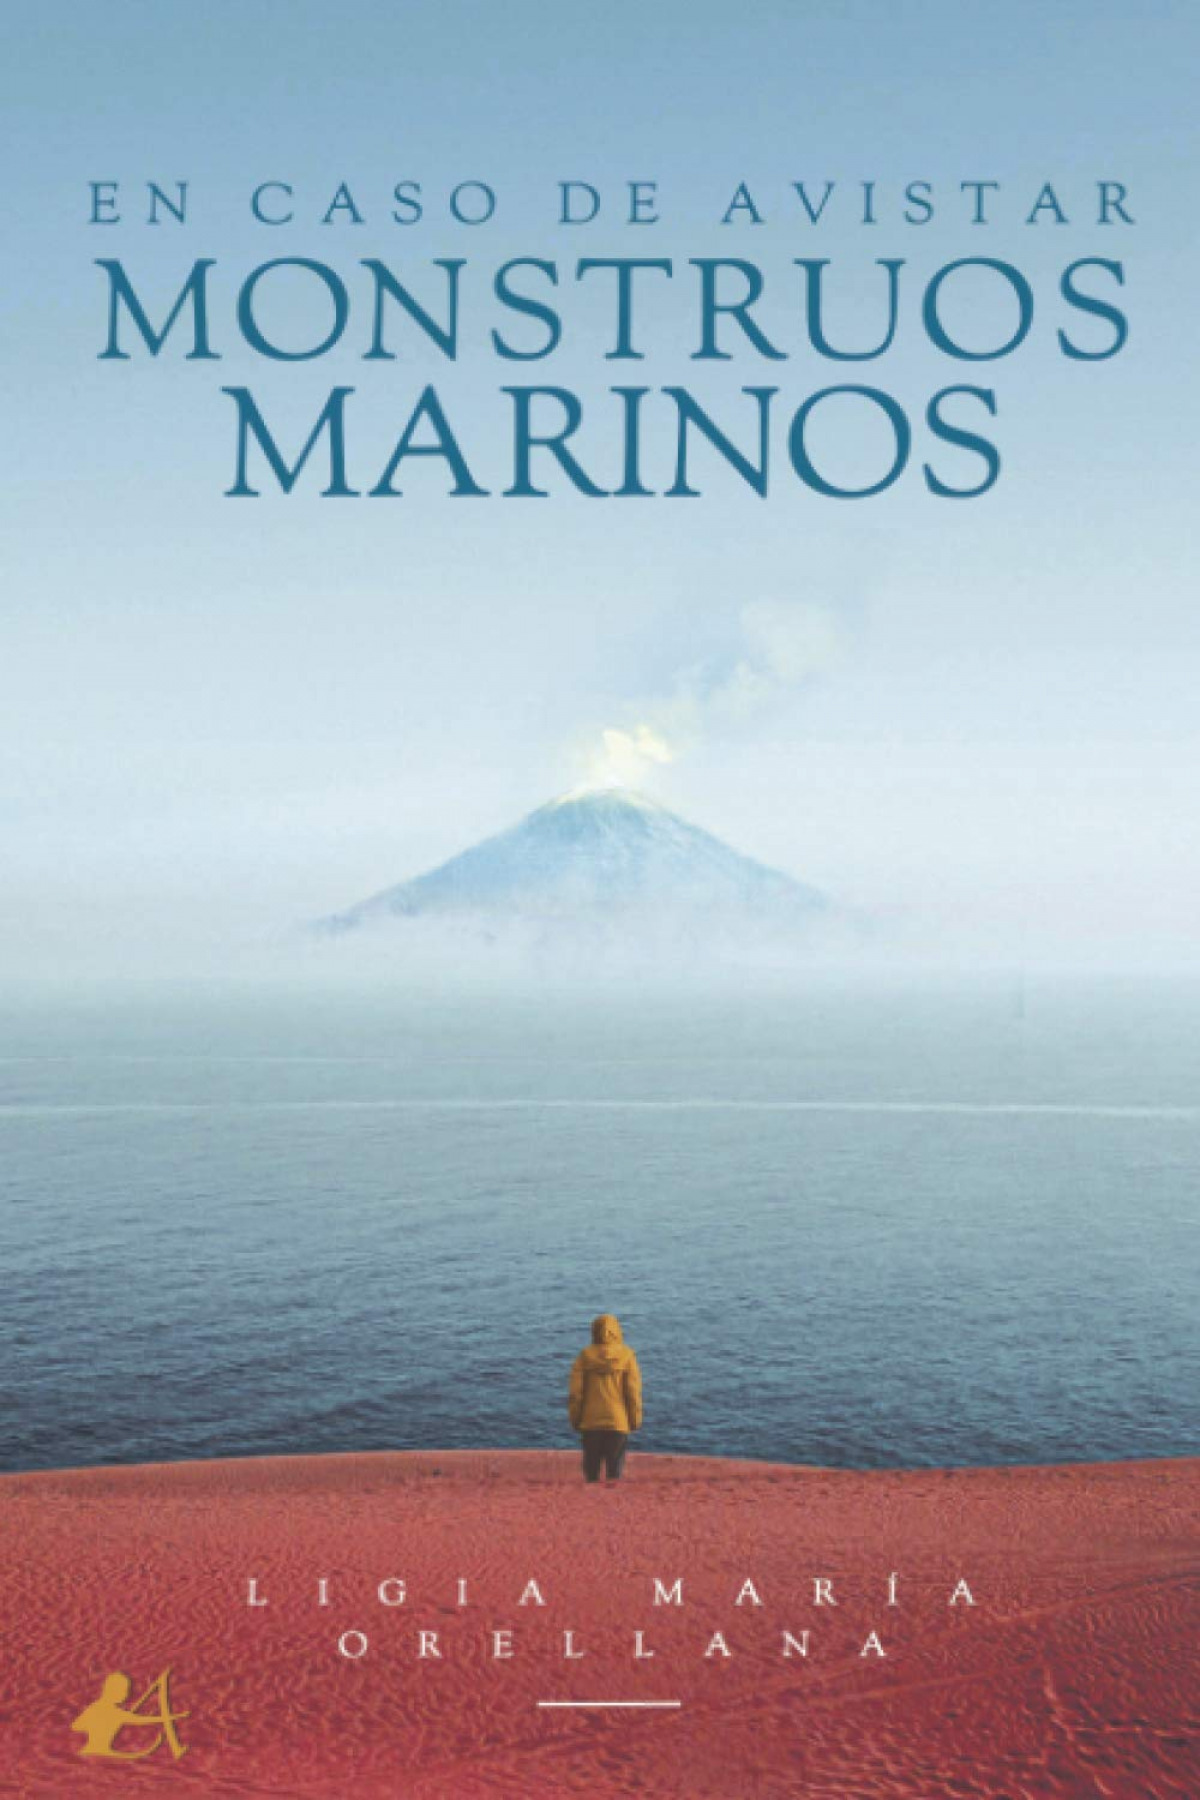 EN CASO DE AVISTAR MONSTRUOS MARINOS